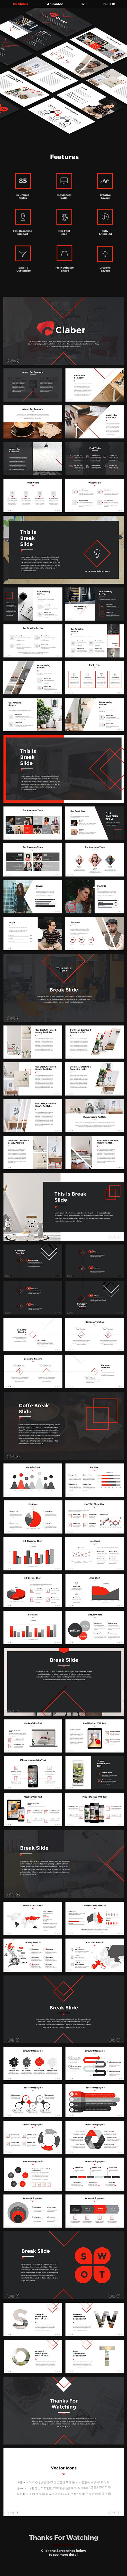 Claber - Creative Keynote Template - Keynote Templates Presentation Templates